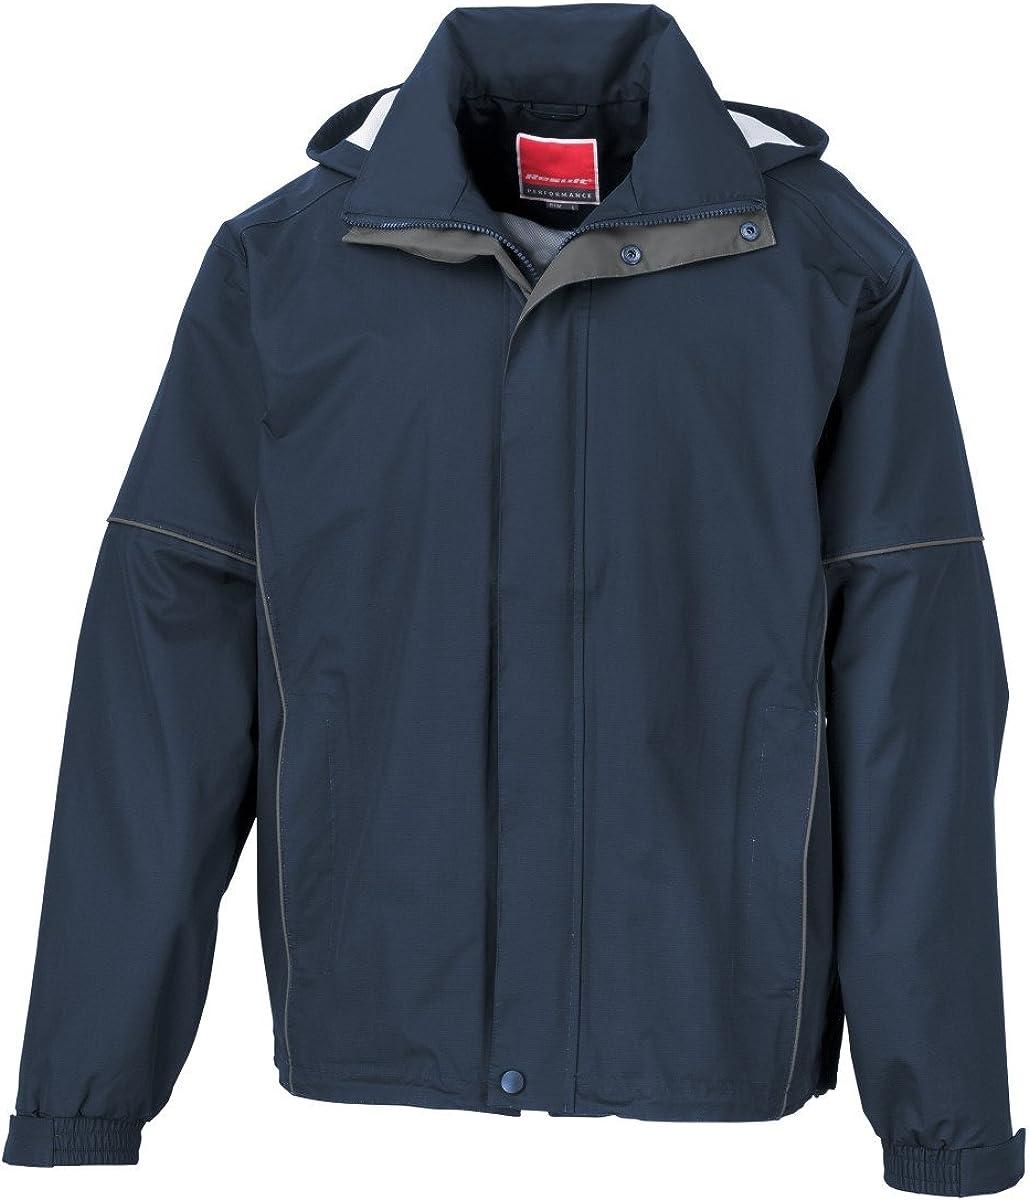 Result Mens Urban Outdoor Fell Lightweight Technical Jacket (Waterproof & Windproof)